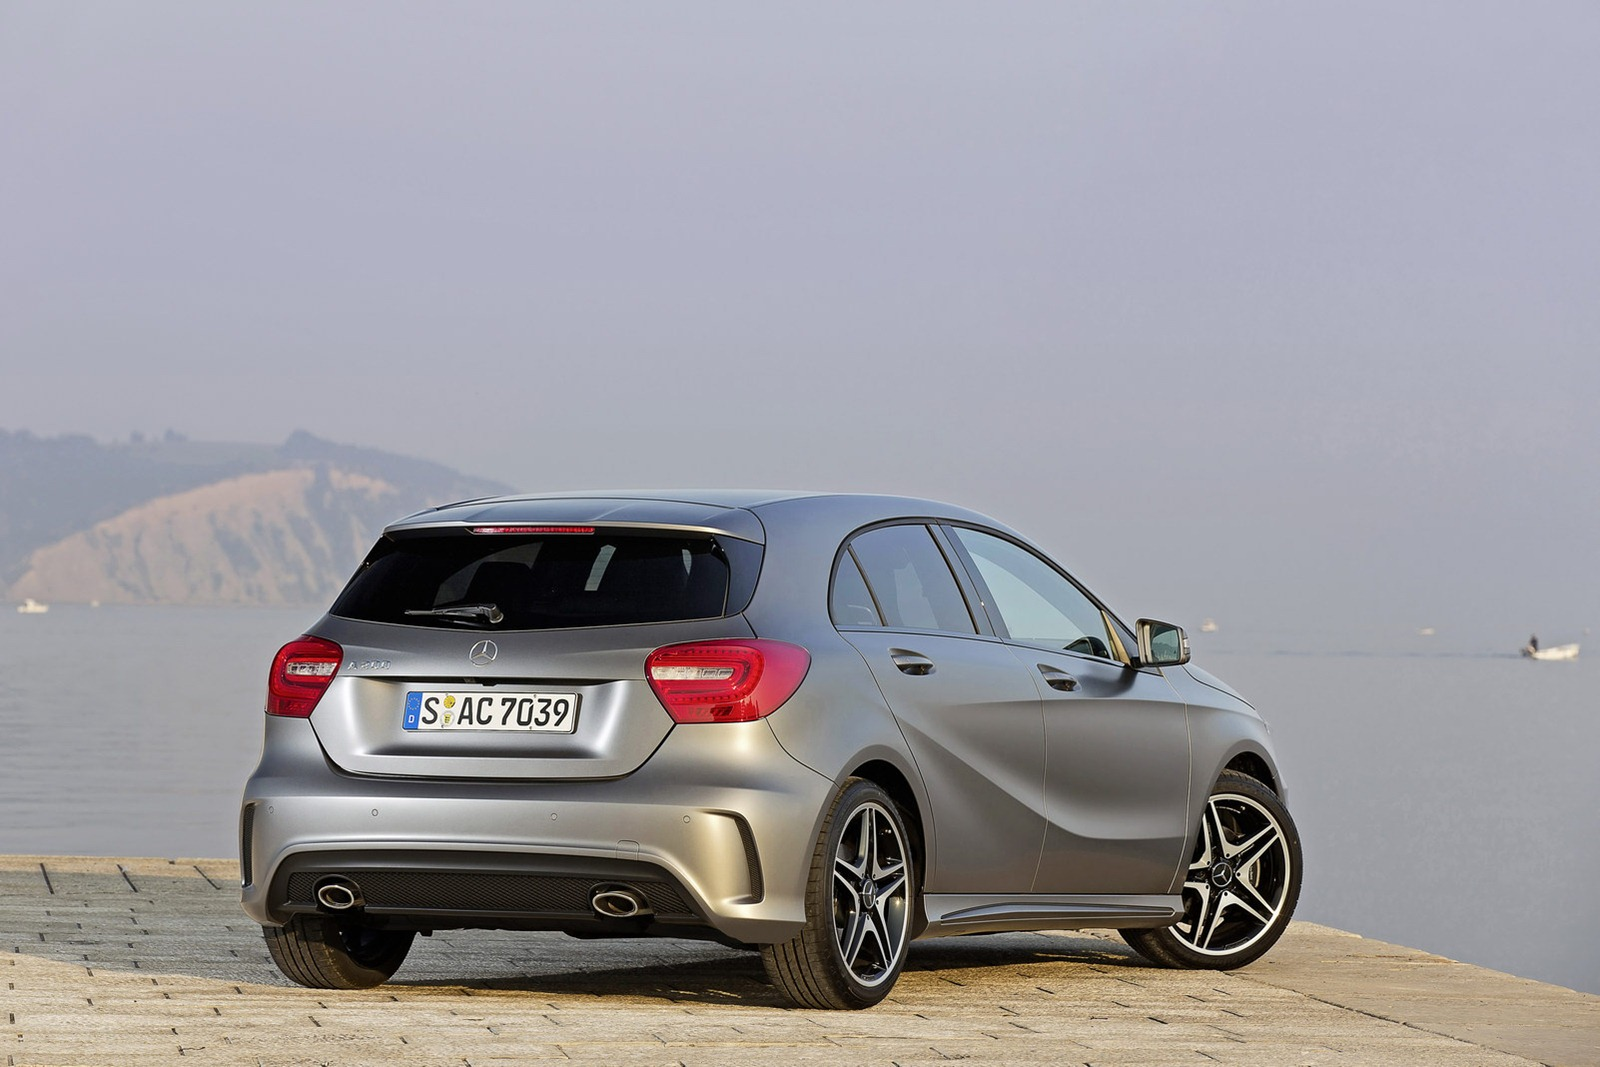 Mercedes benz releases new photos of 2013 a class for A class mercedes benz